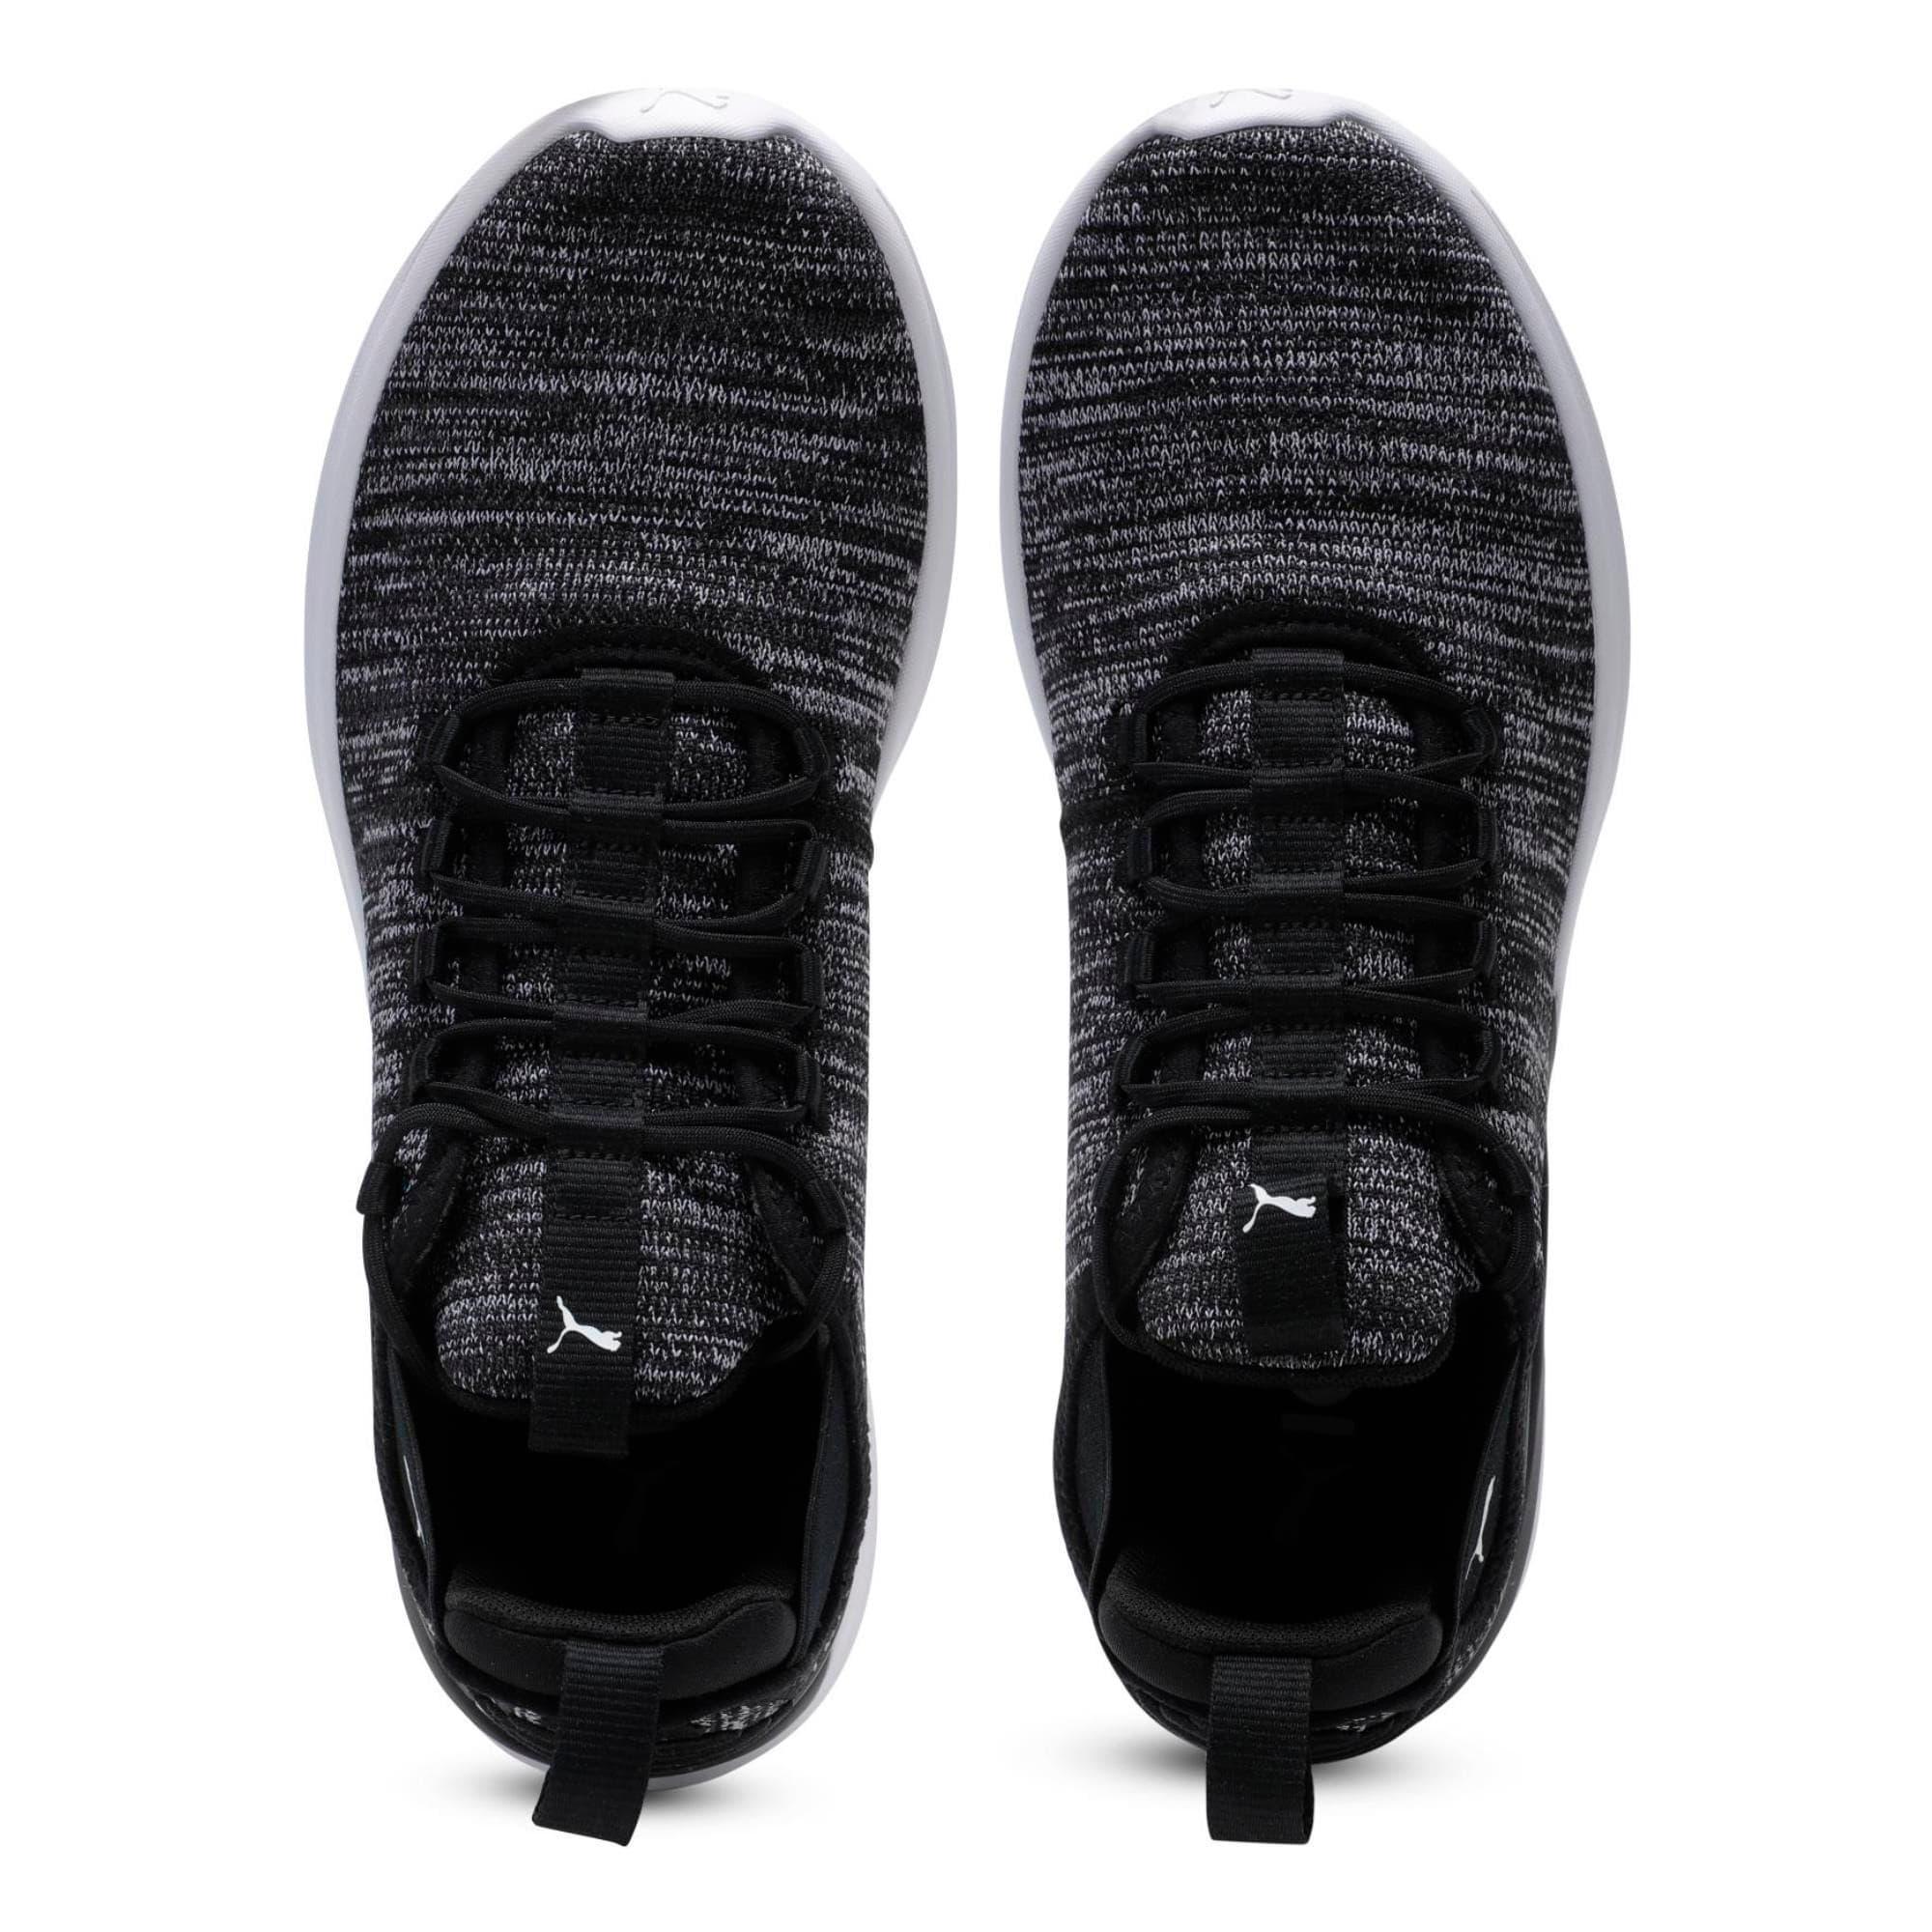 Thumbnail 6 of Flash Daunt Men's Running Shoes, Puma Black-Asphalt- White, medium-IND